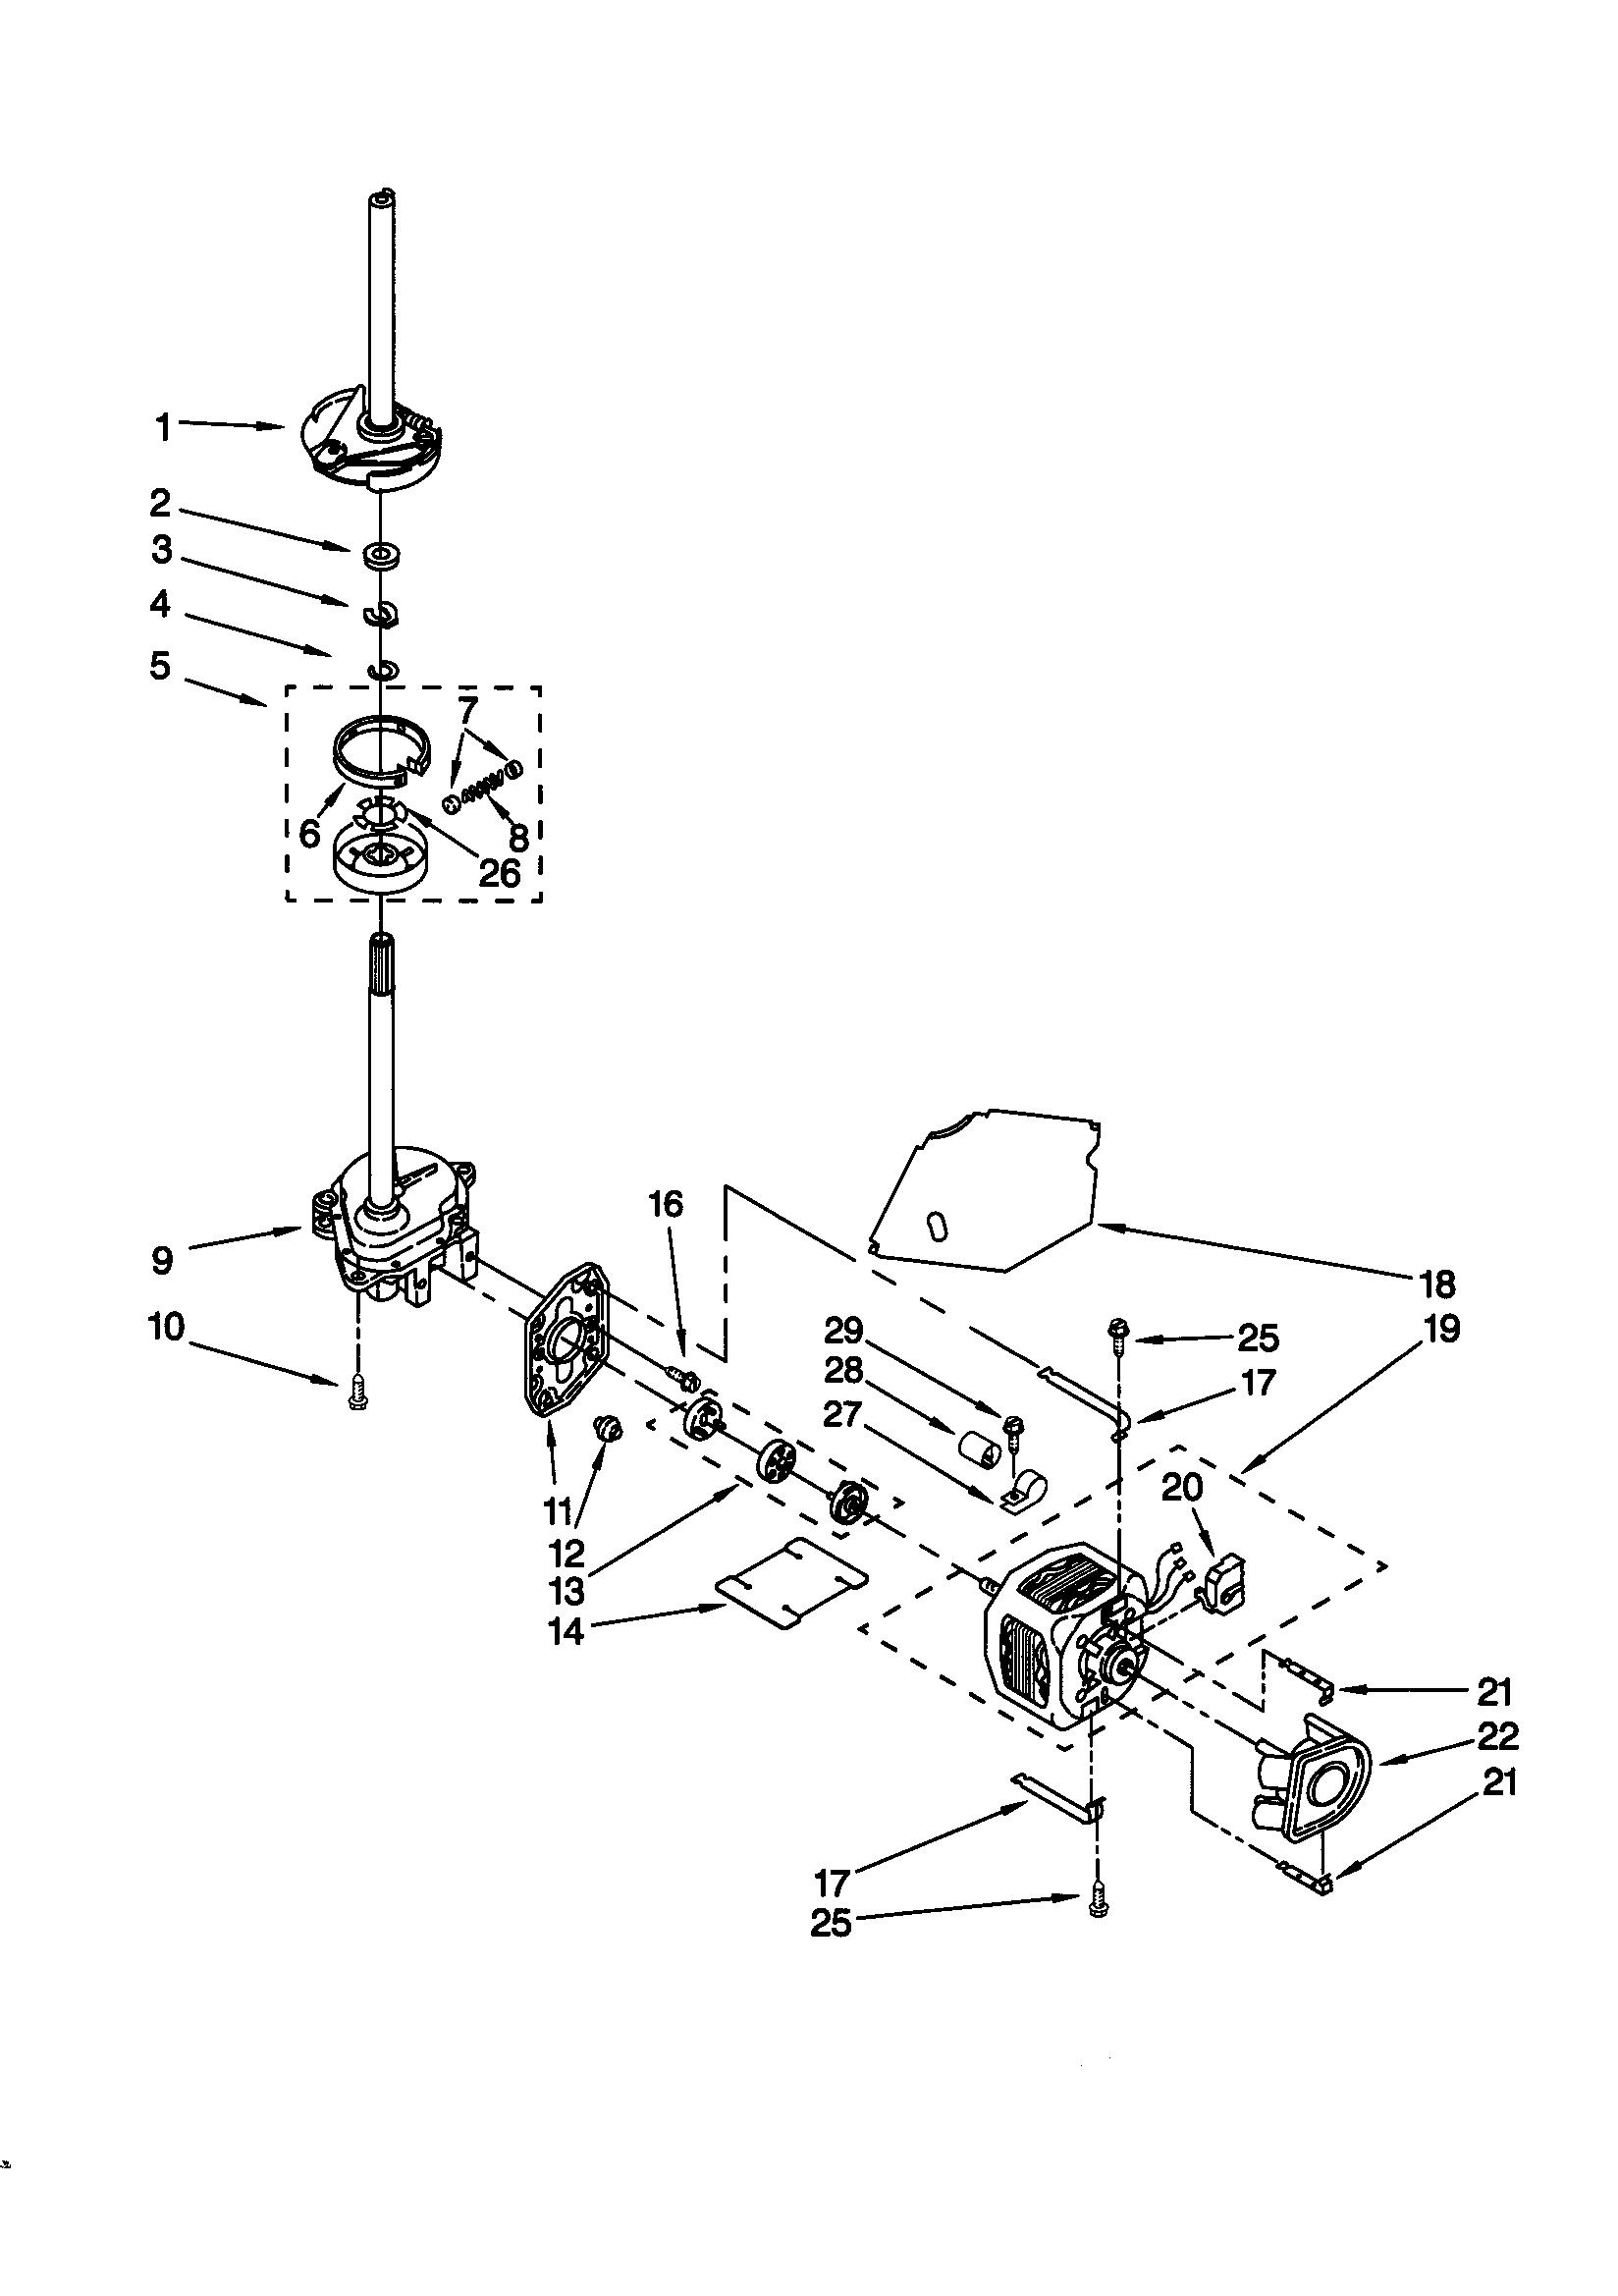 Kenmore 110 Start Capacitor